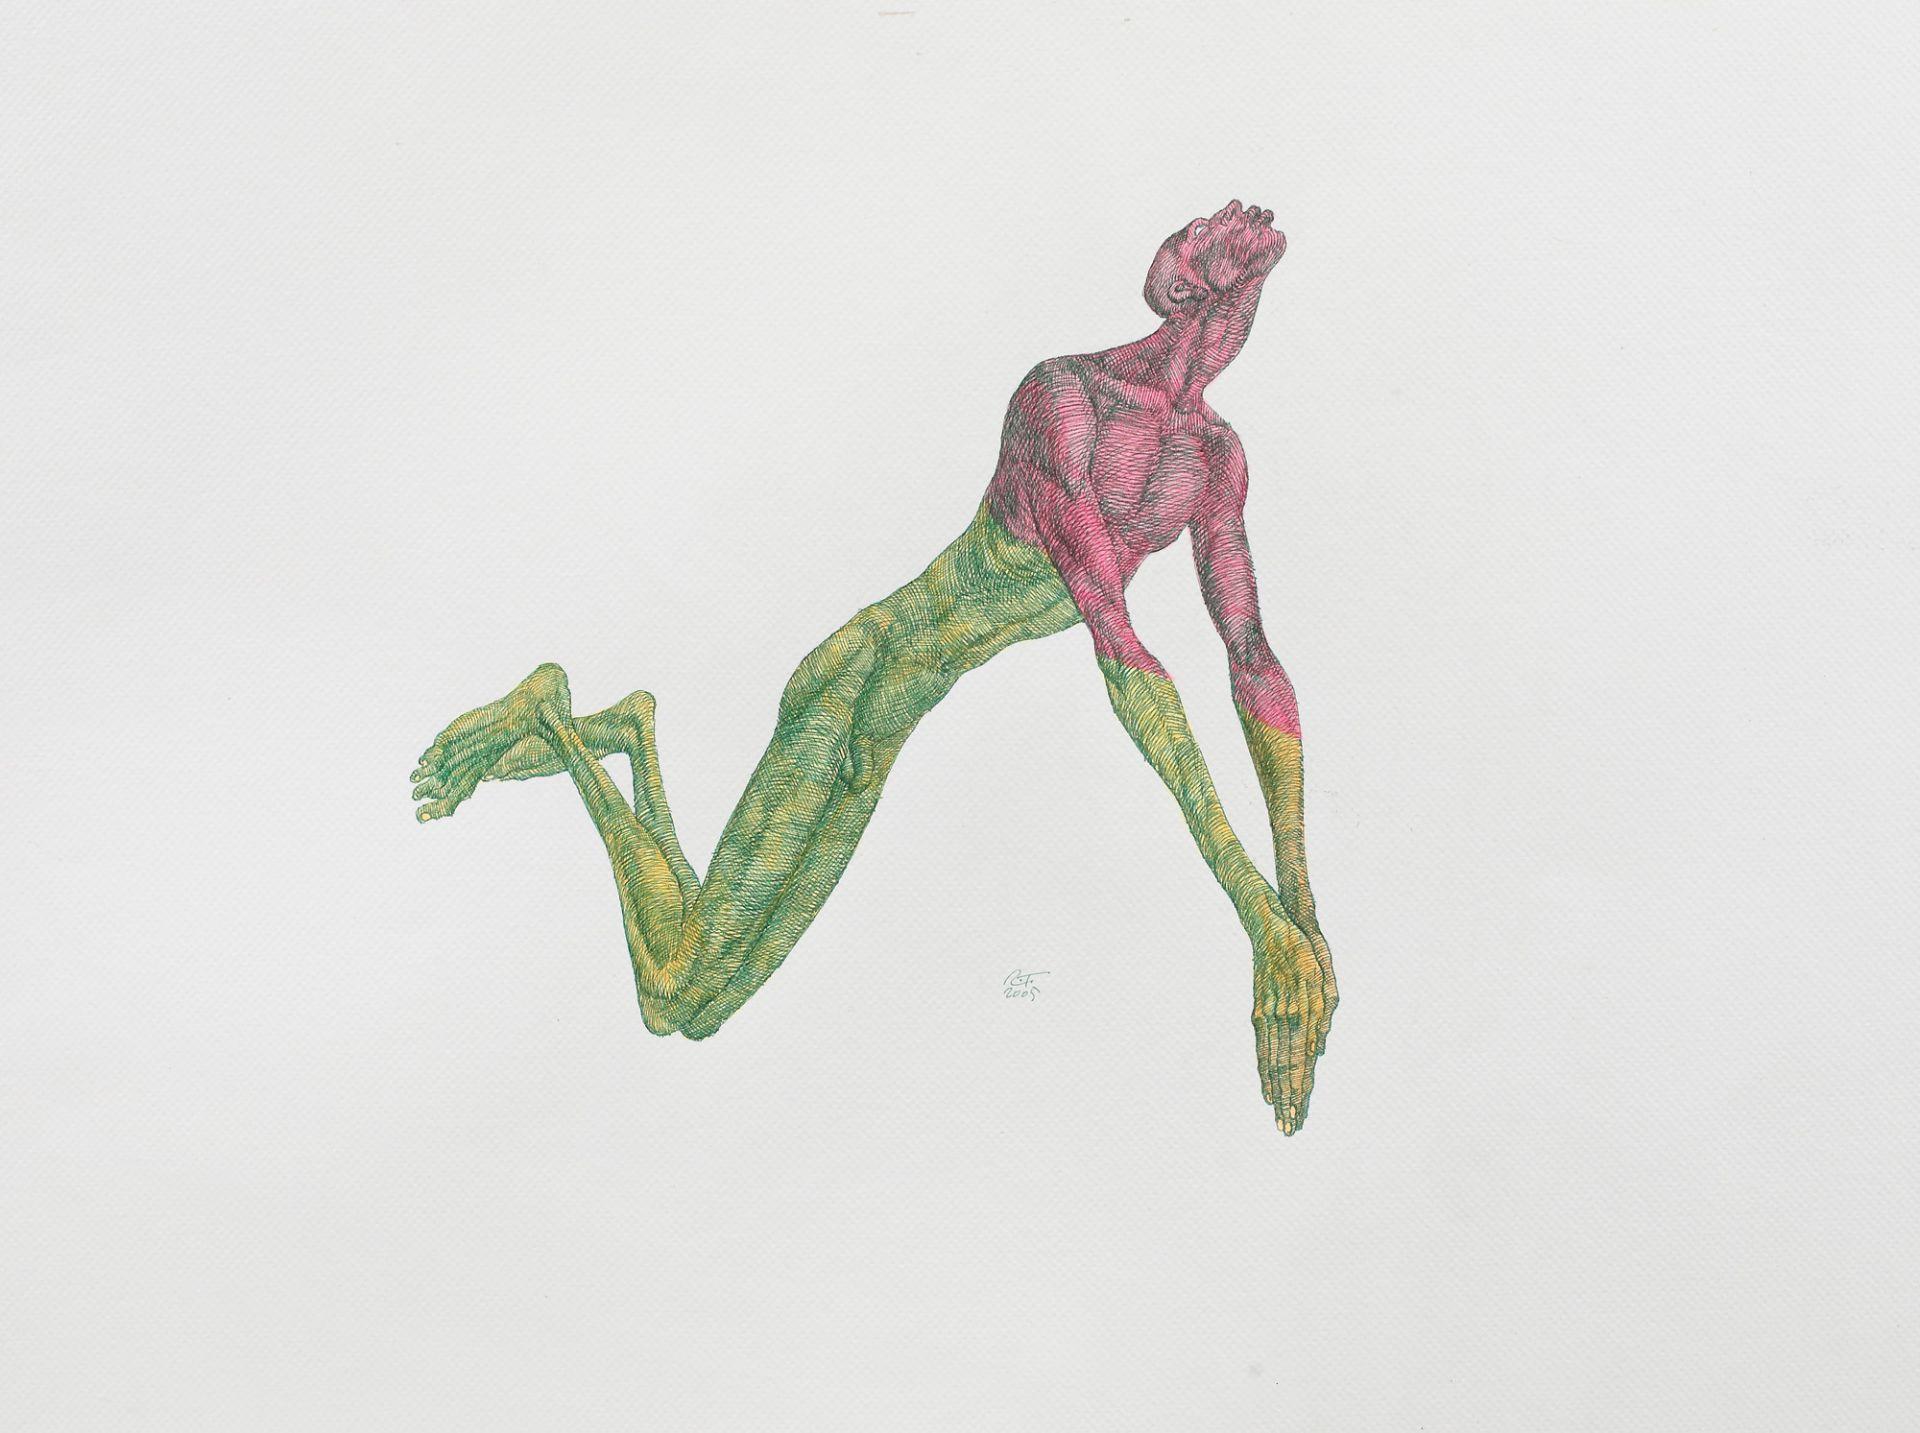 Roman Tolici, Affective StatusRoman Tolici, Affective Status, ink and felt-tip pen on paper, 50